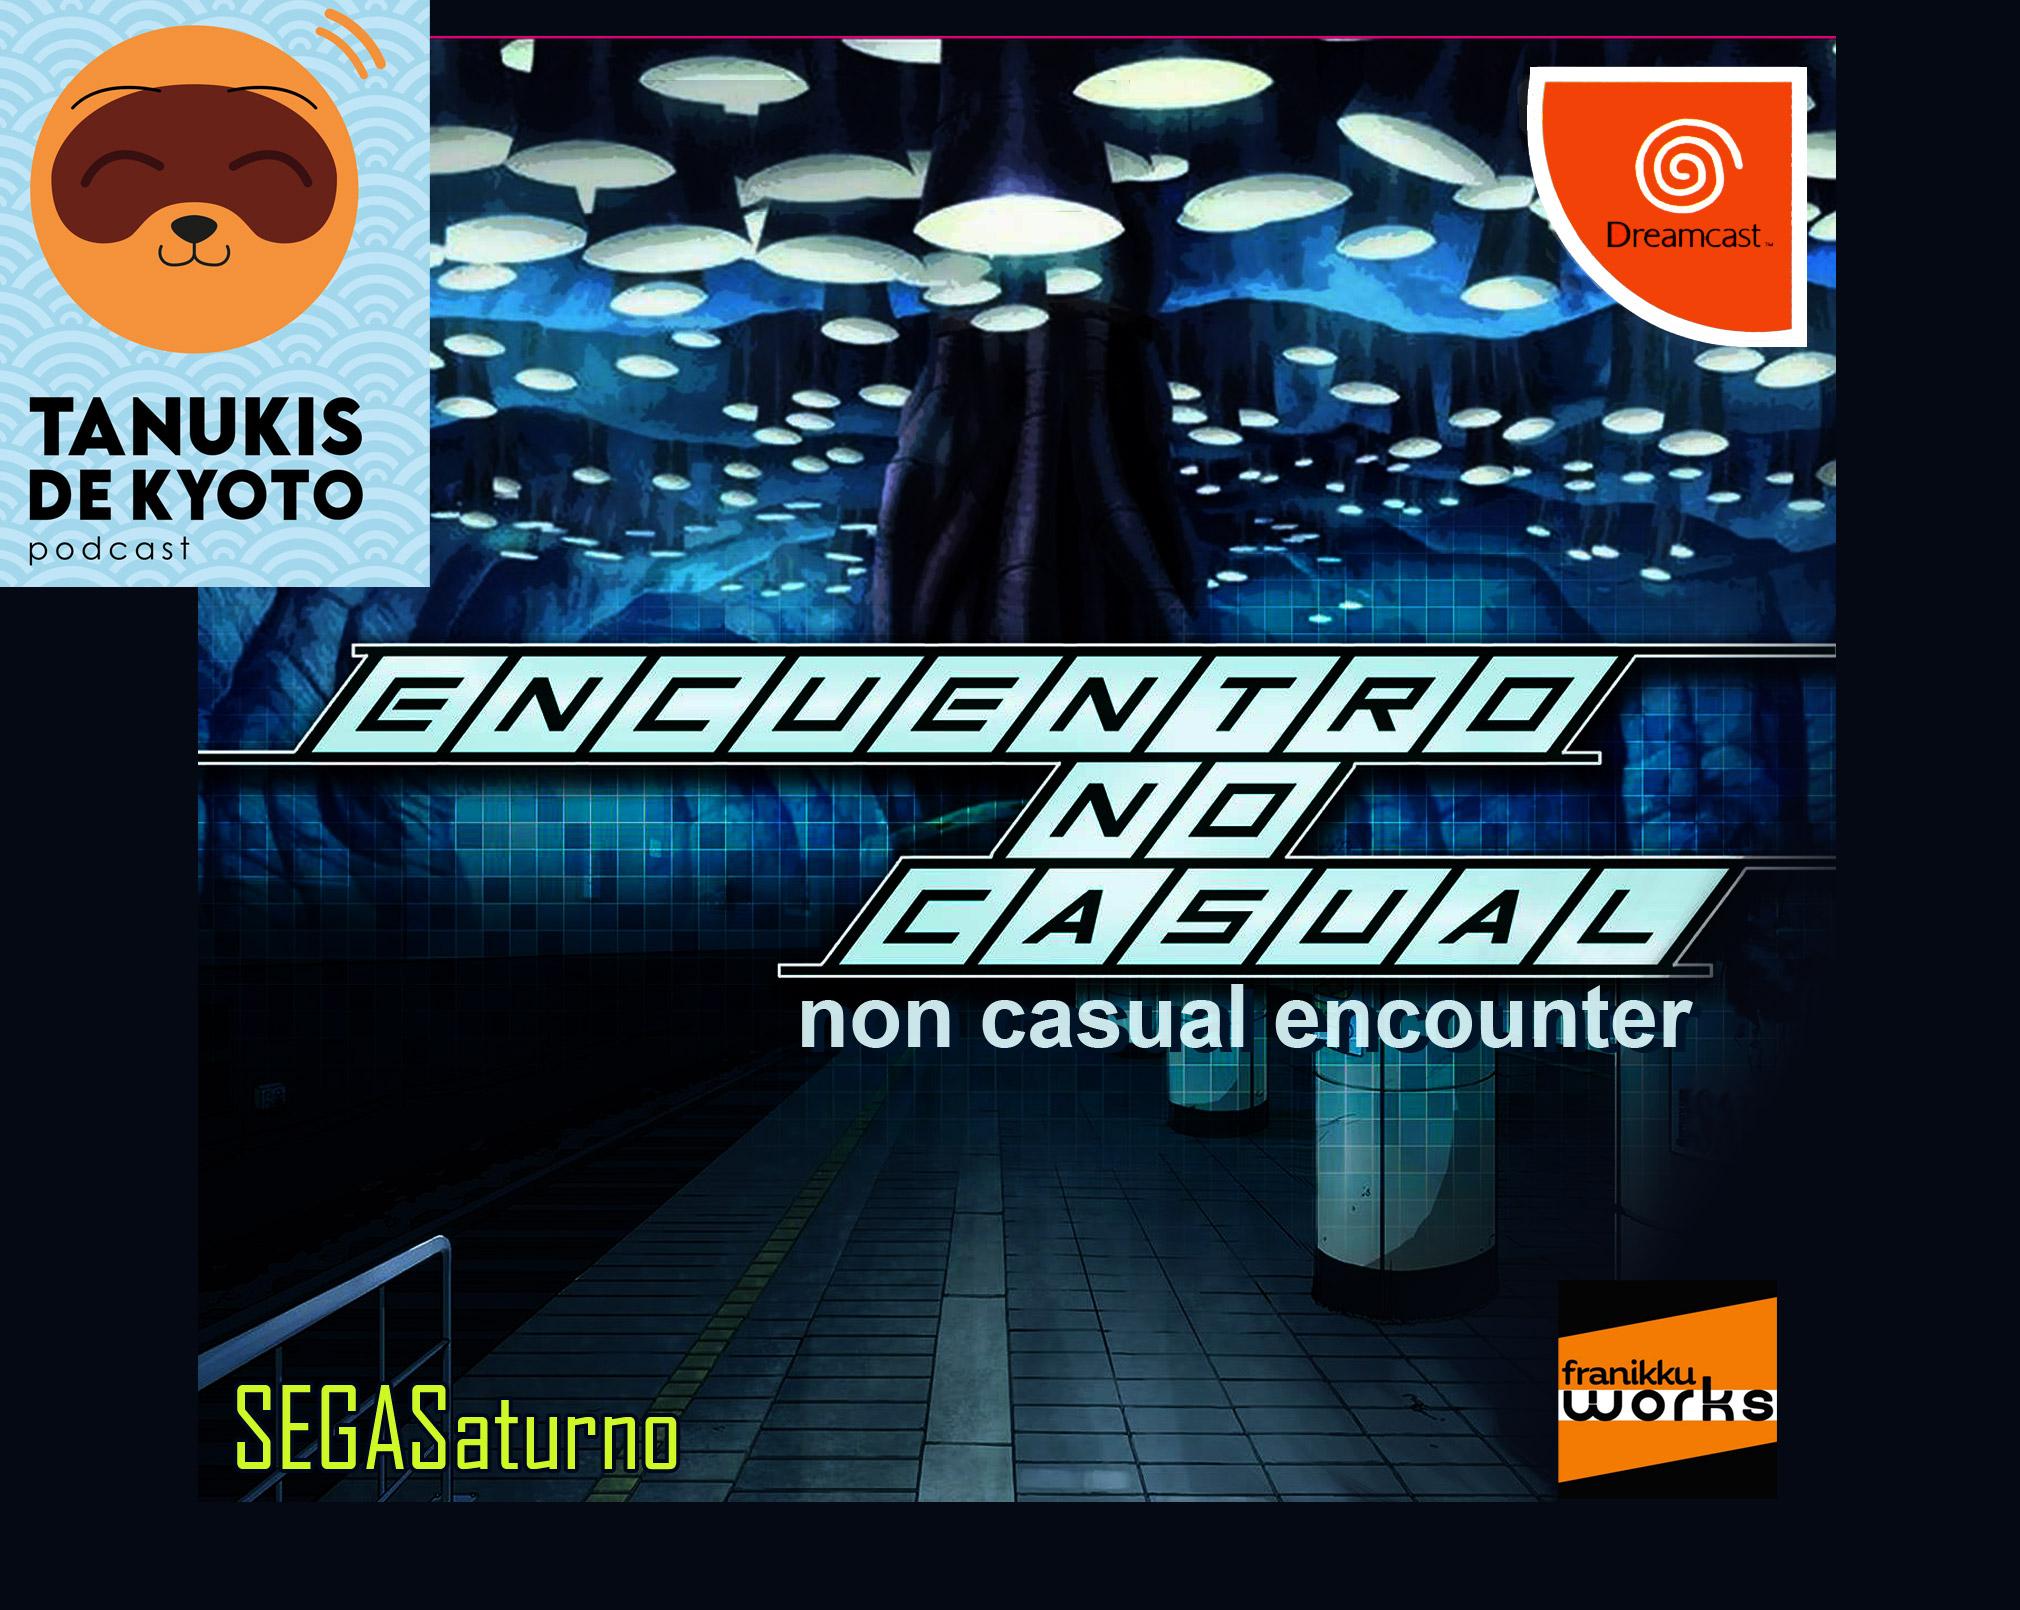 non casual encounter dreamcast indie game dreamcast encuentro no casual BennuGD